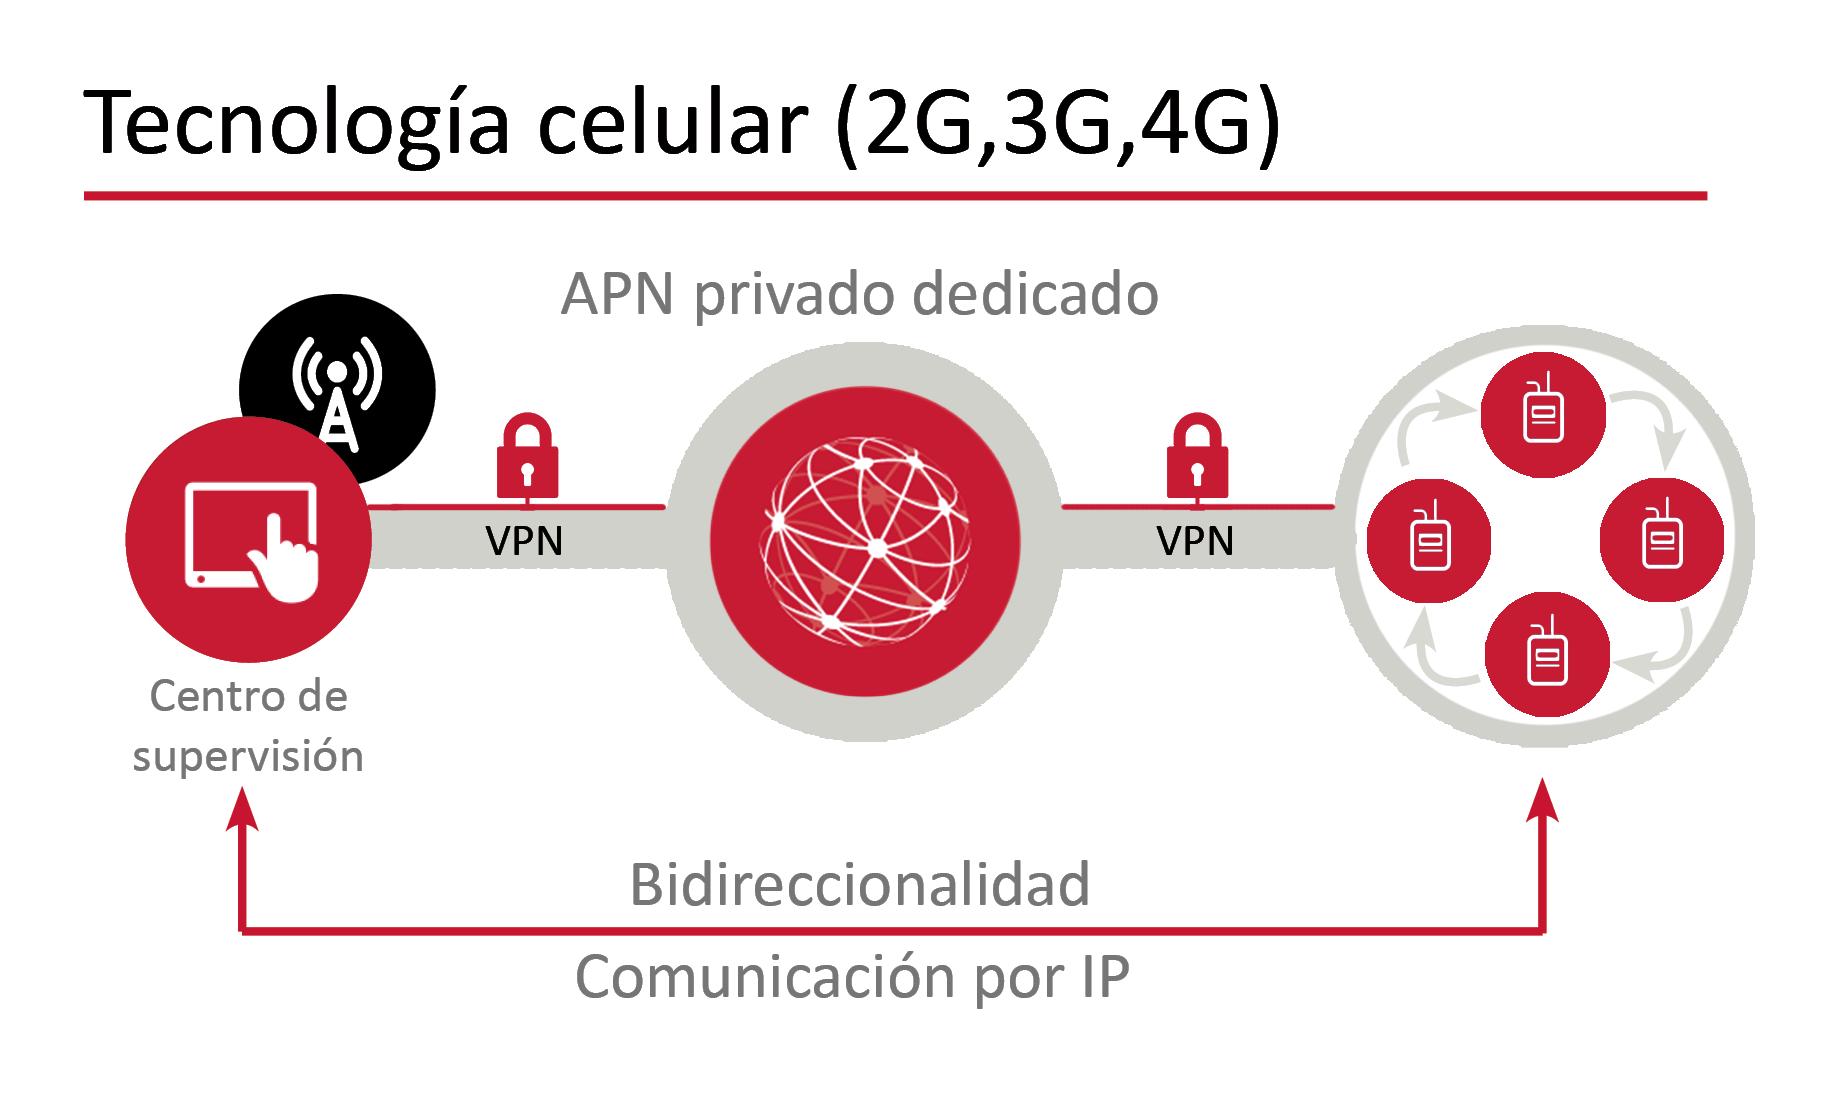 esquema-grn-tecnologia-rtc-vs-celular-2b